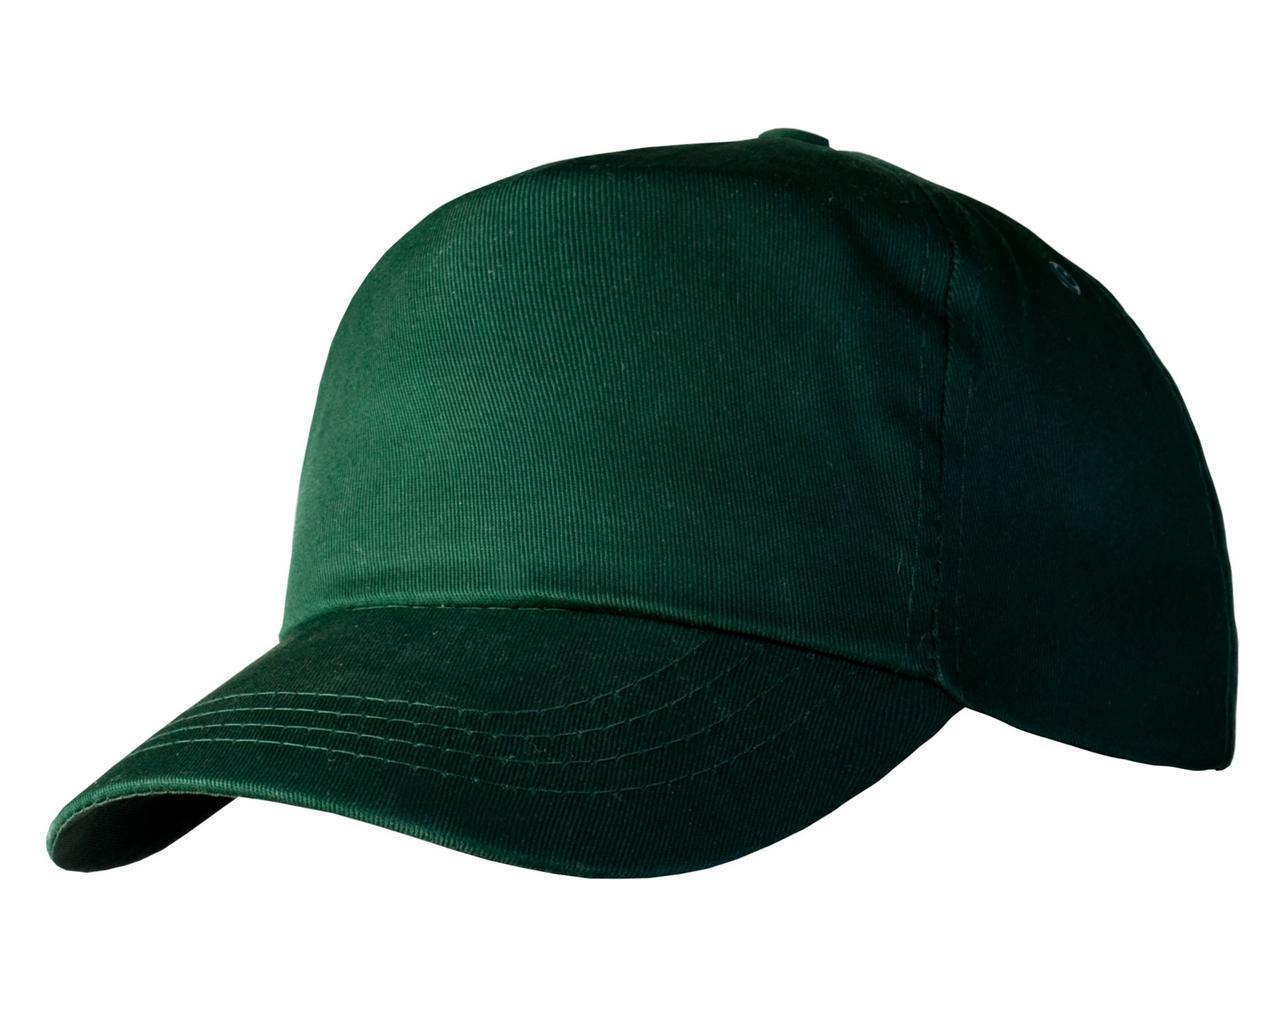 Бейсболка Unit Promo, темно-зеленая (артикул 1846.91)